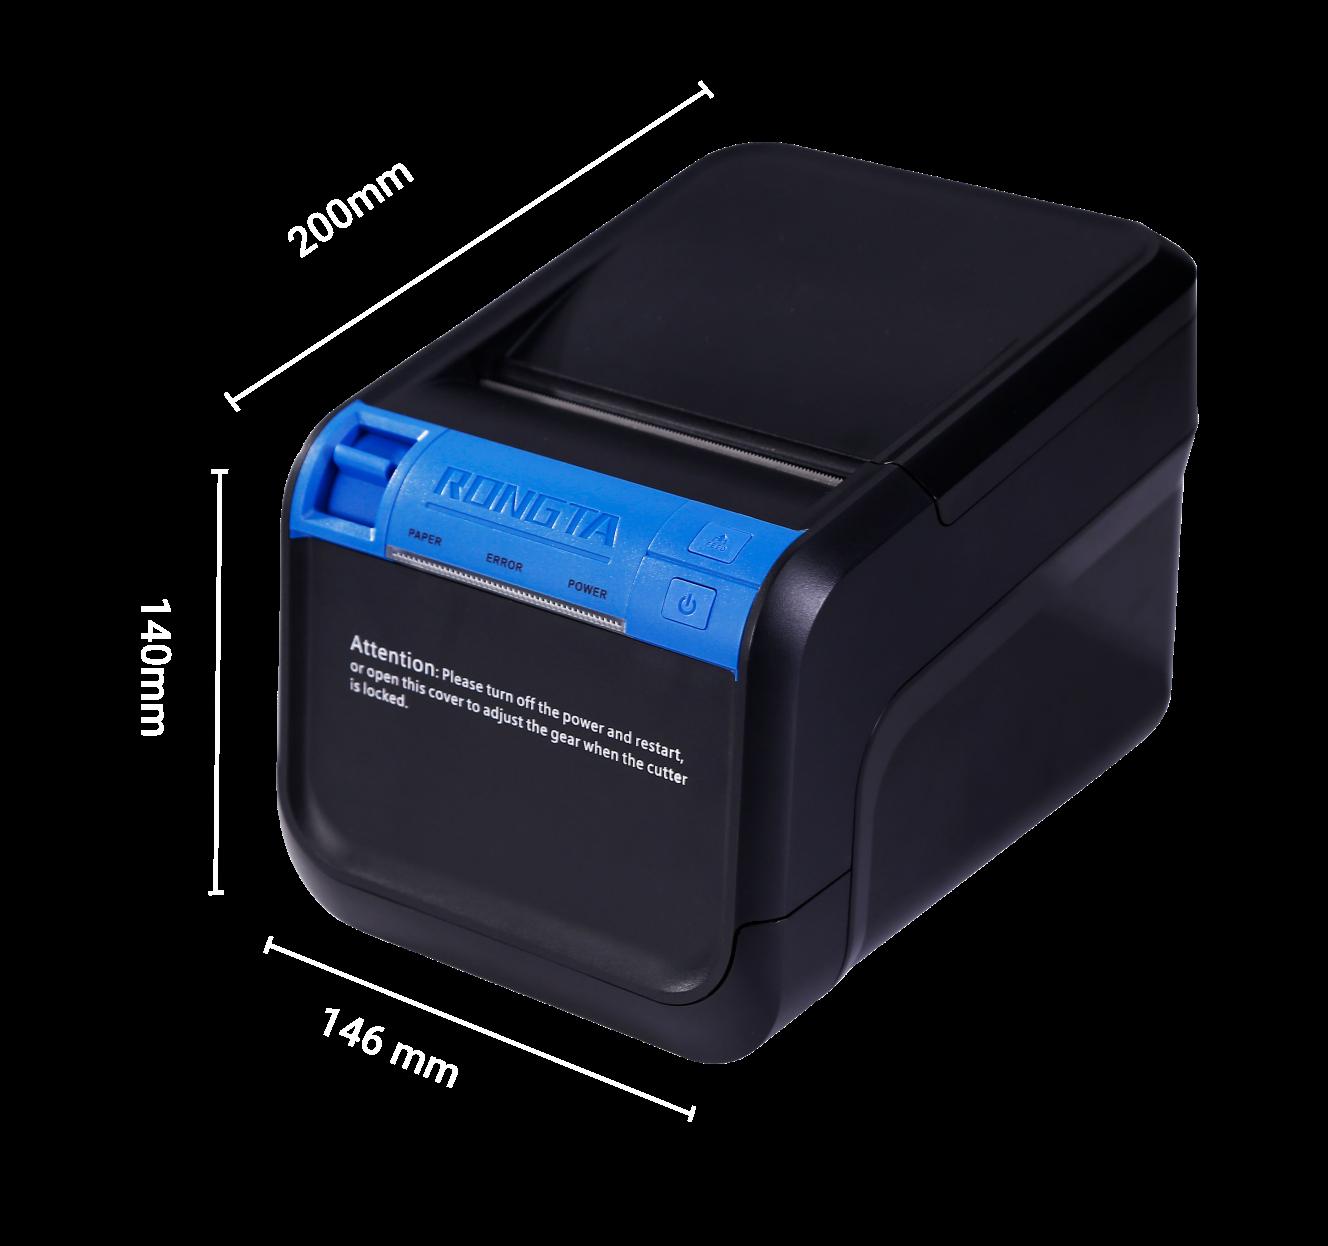 ACE V1 80mm Thermal Printer - ePOS Hybrid